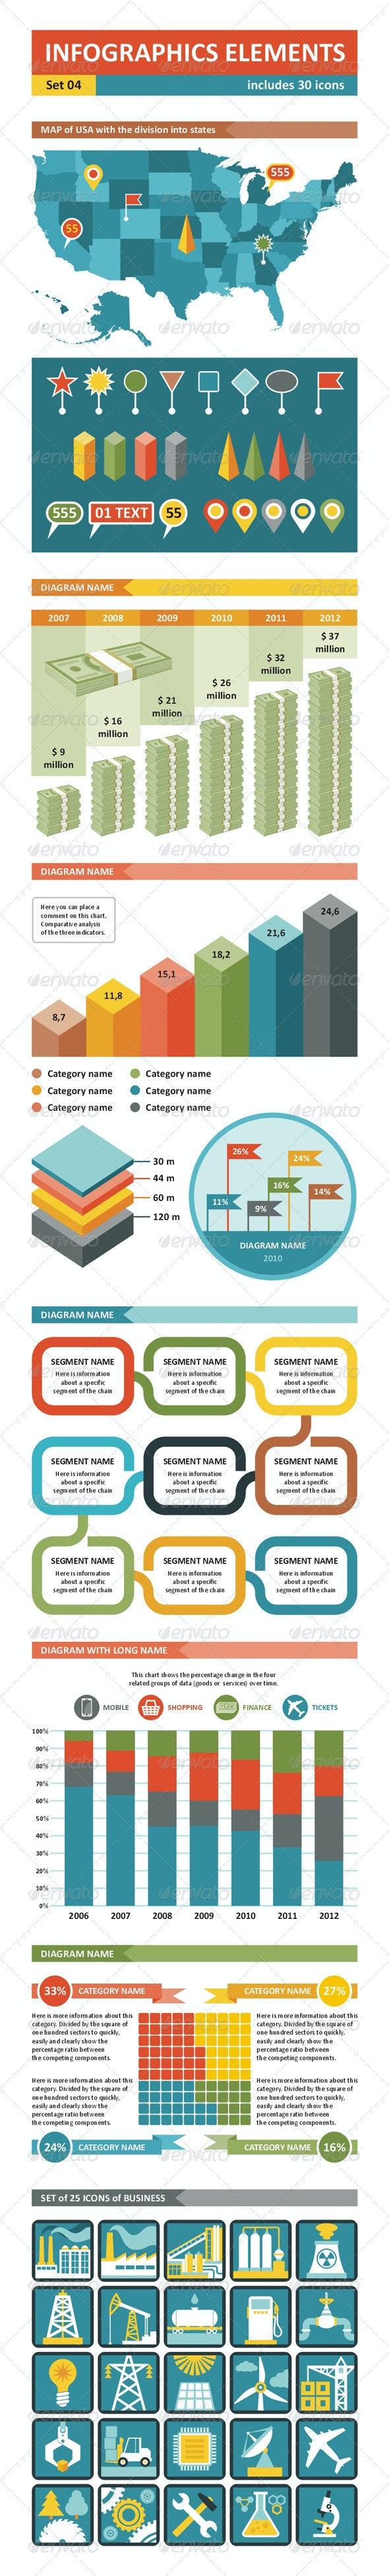 Infographics Elements - set 04 - Infographics